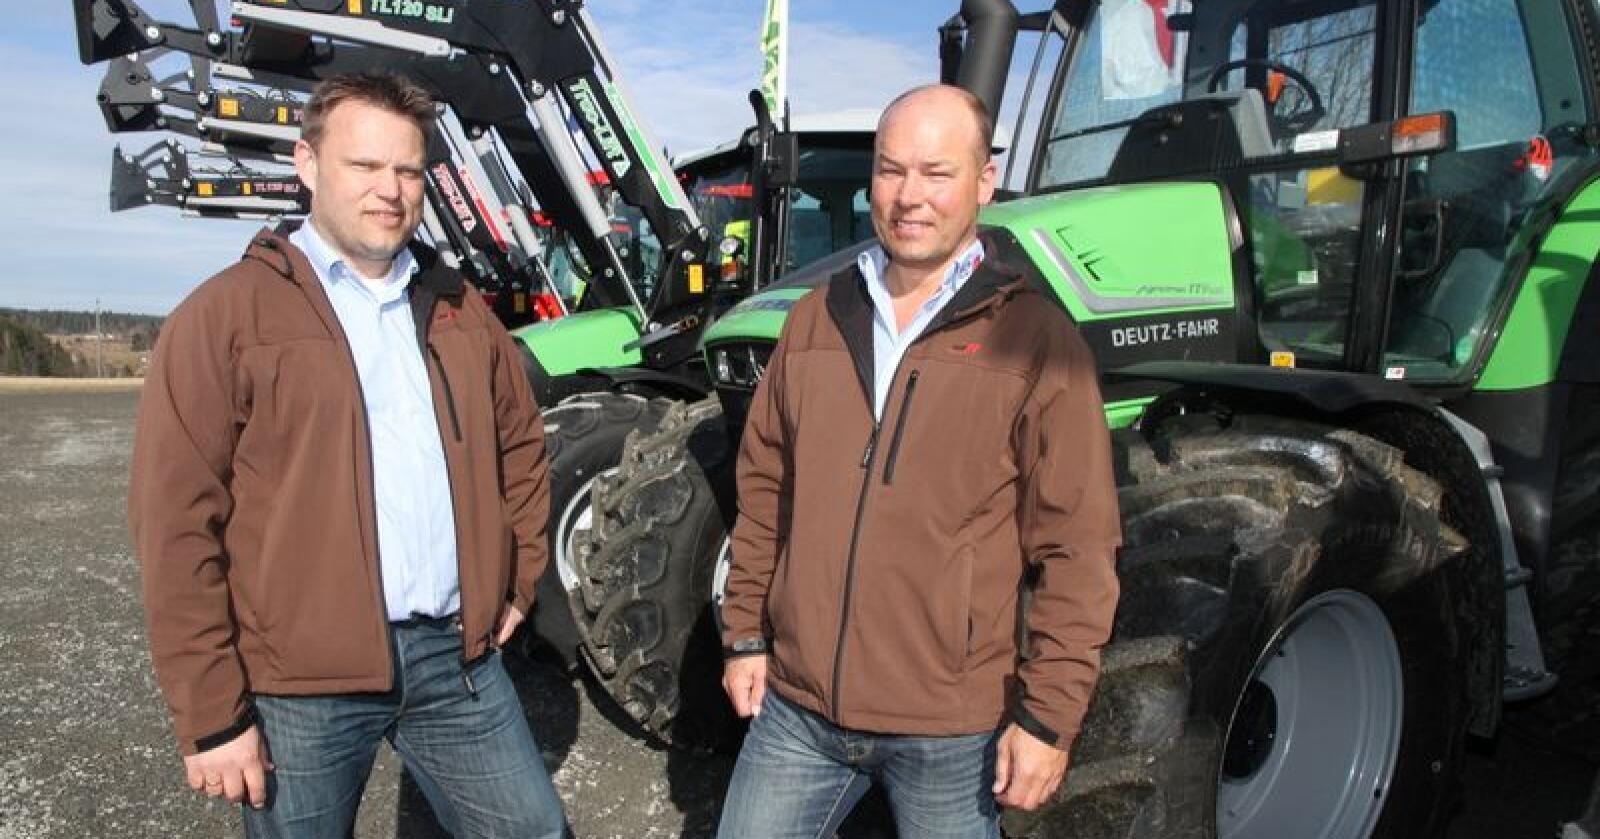 Adm.dirk. i HCP, Lars Wear og produktsjef Arne Røed er godt fornøyde med å ha fått etbablert ny forhandler i Hallingdal. (Foto: Iver Gamme)